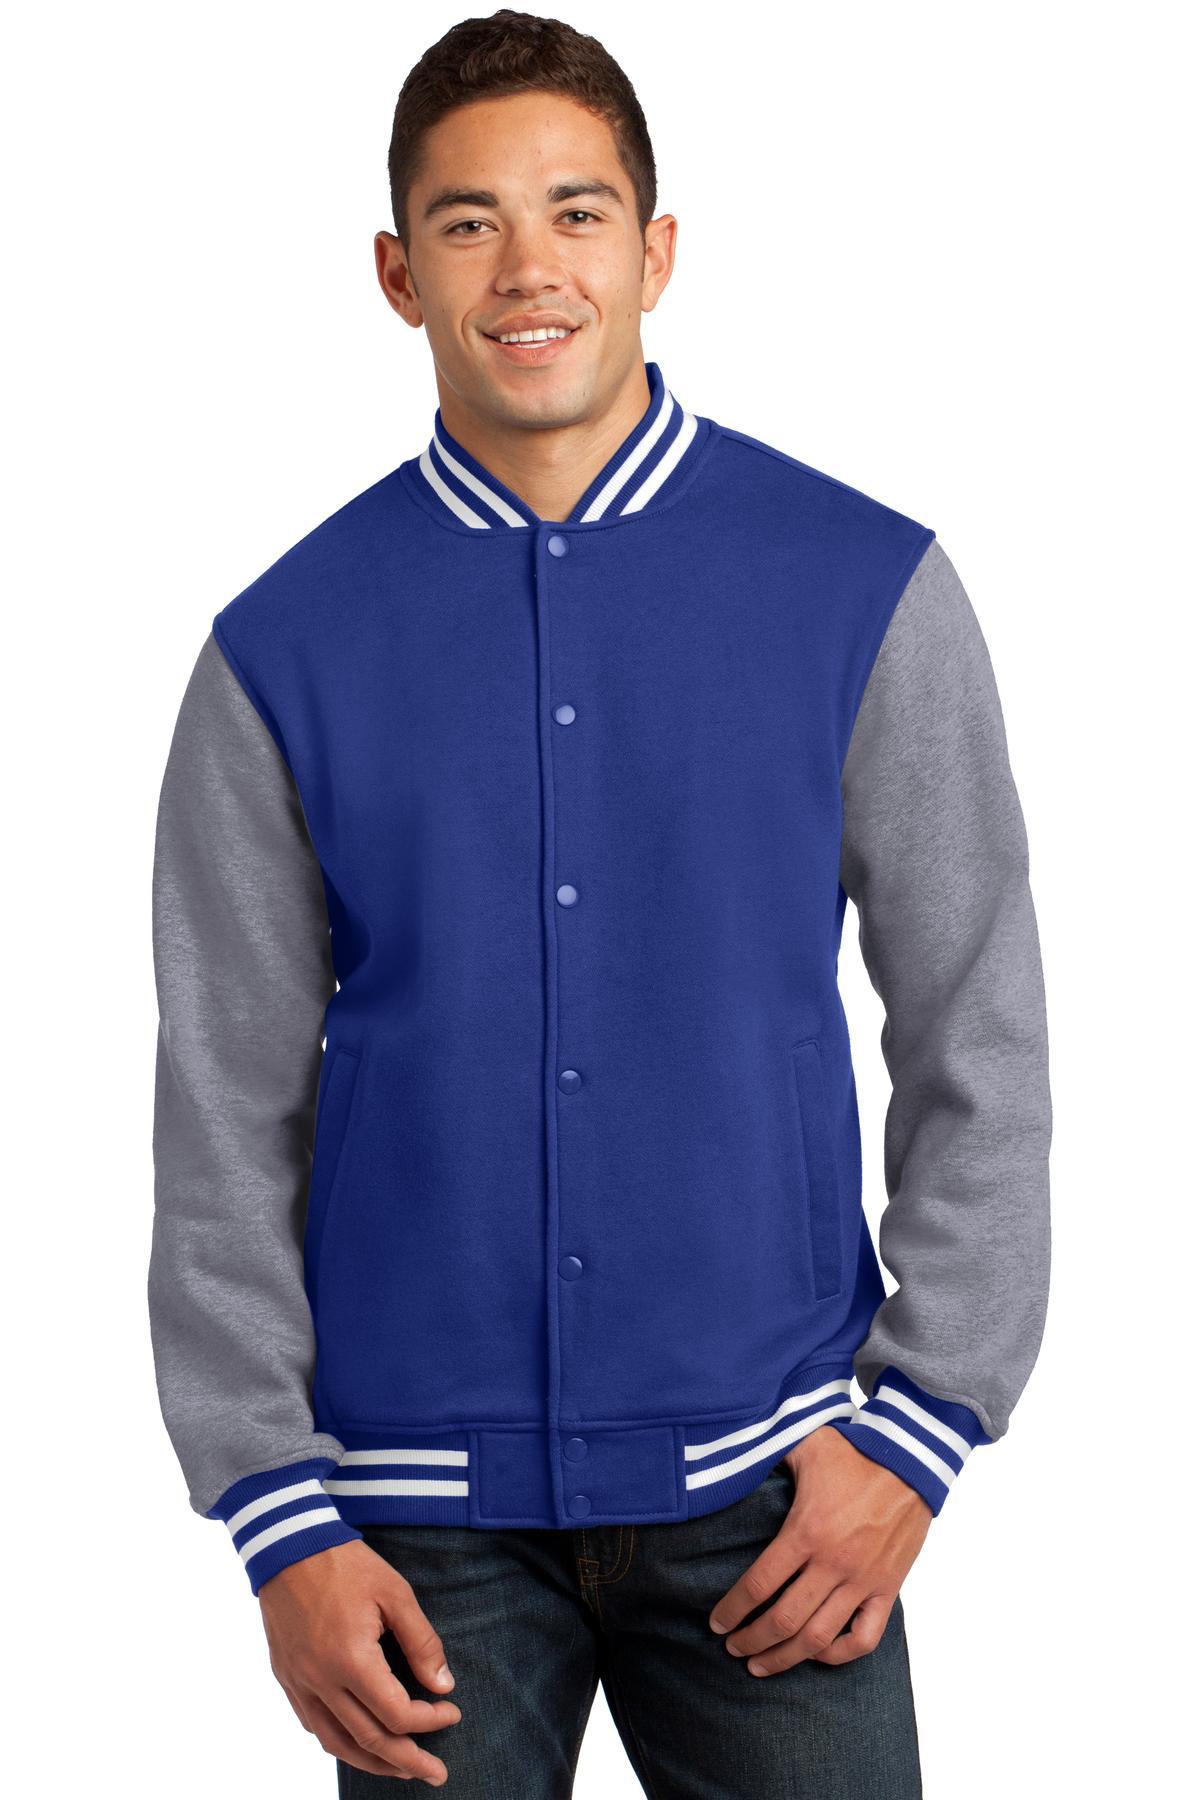 Sweatshirts-Fleece-Full-Zip-6